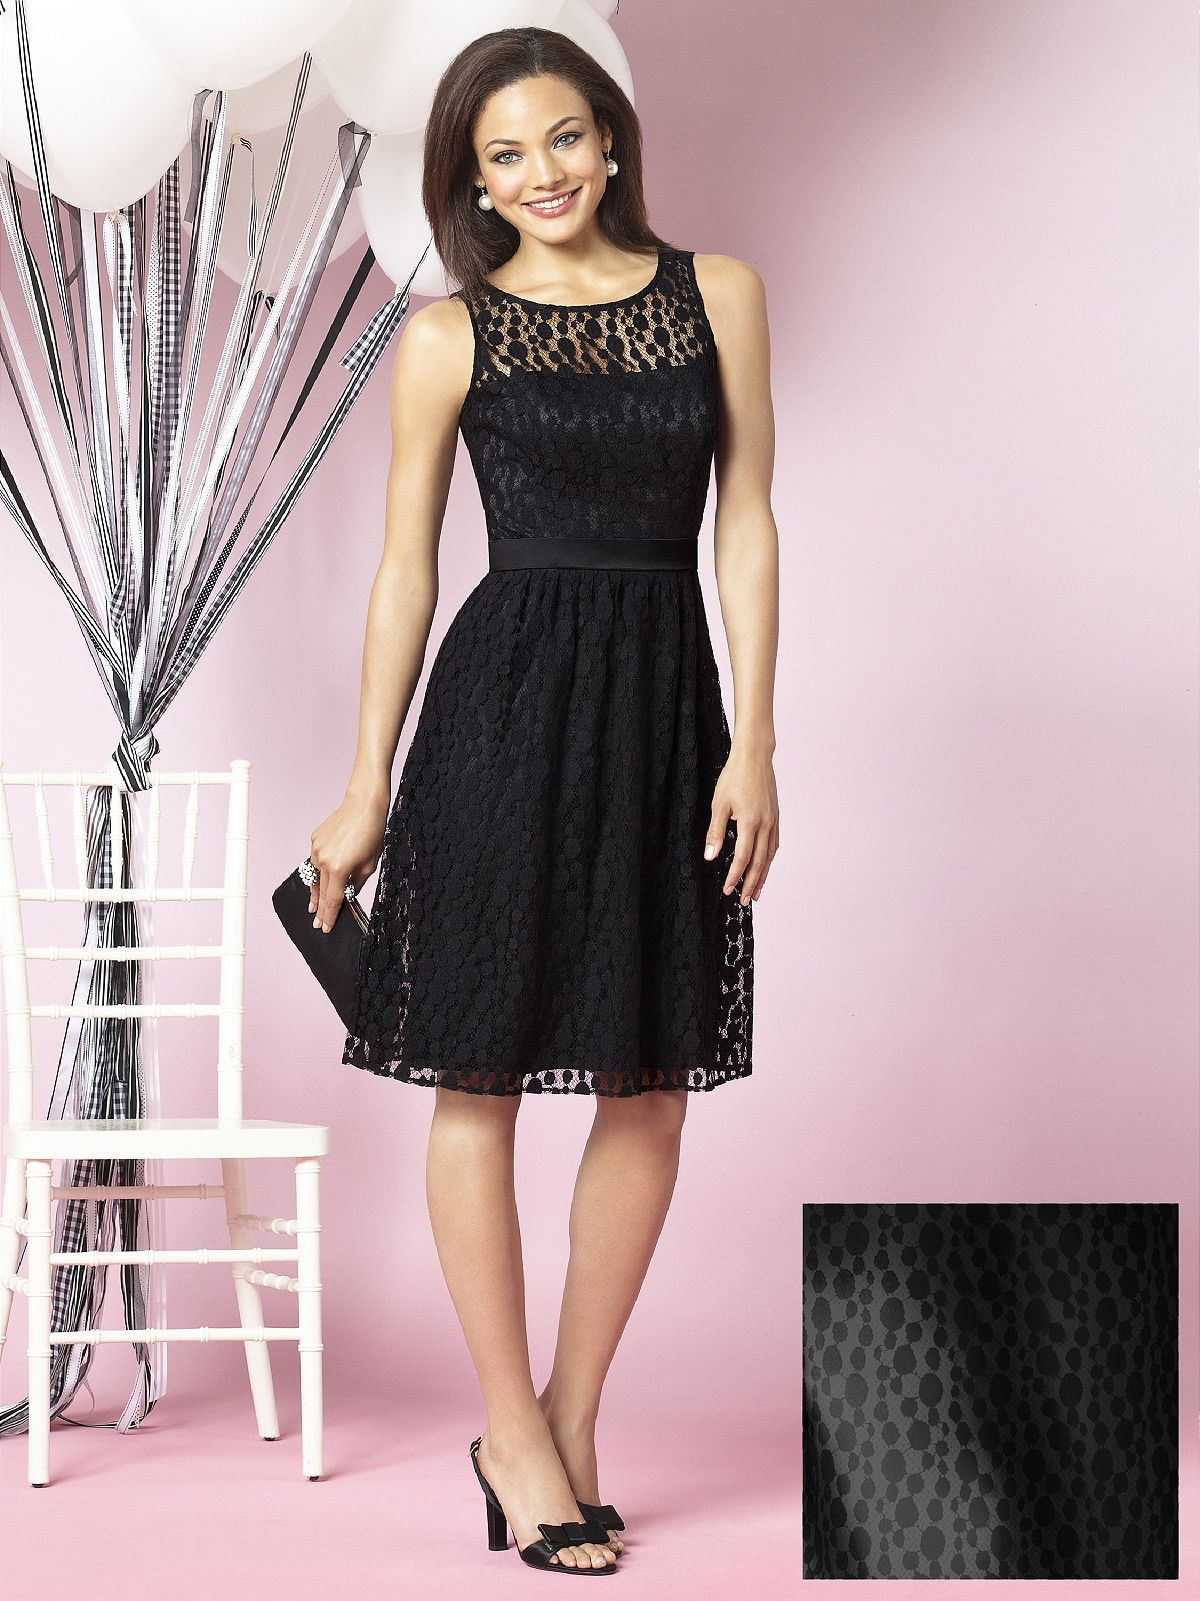 Black lace bridesmaid dress fashjourney black bridesmaid black lace bridesmaid dress fashjourney ombrellifo Choice Image